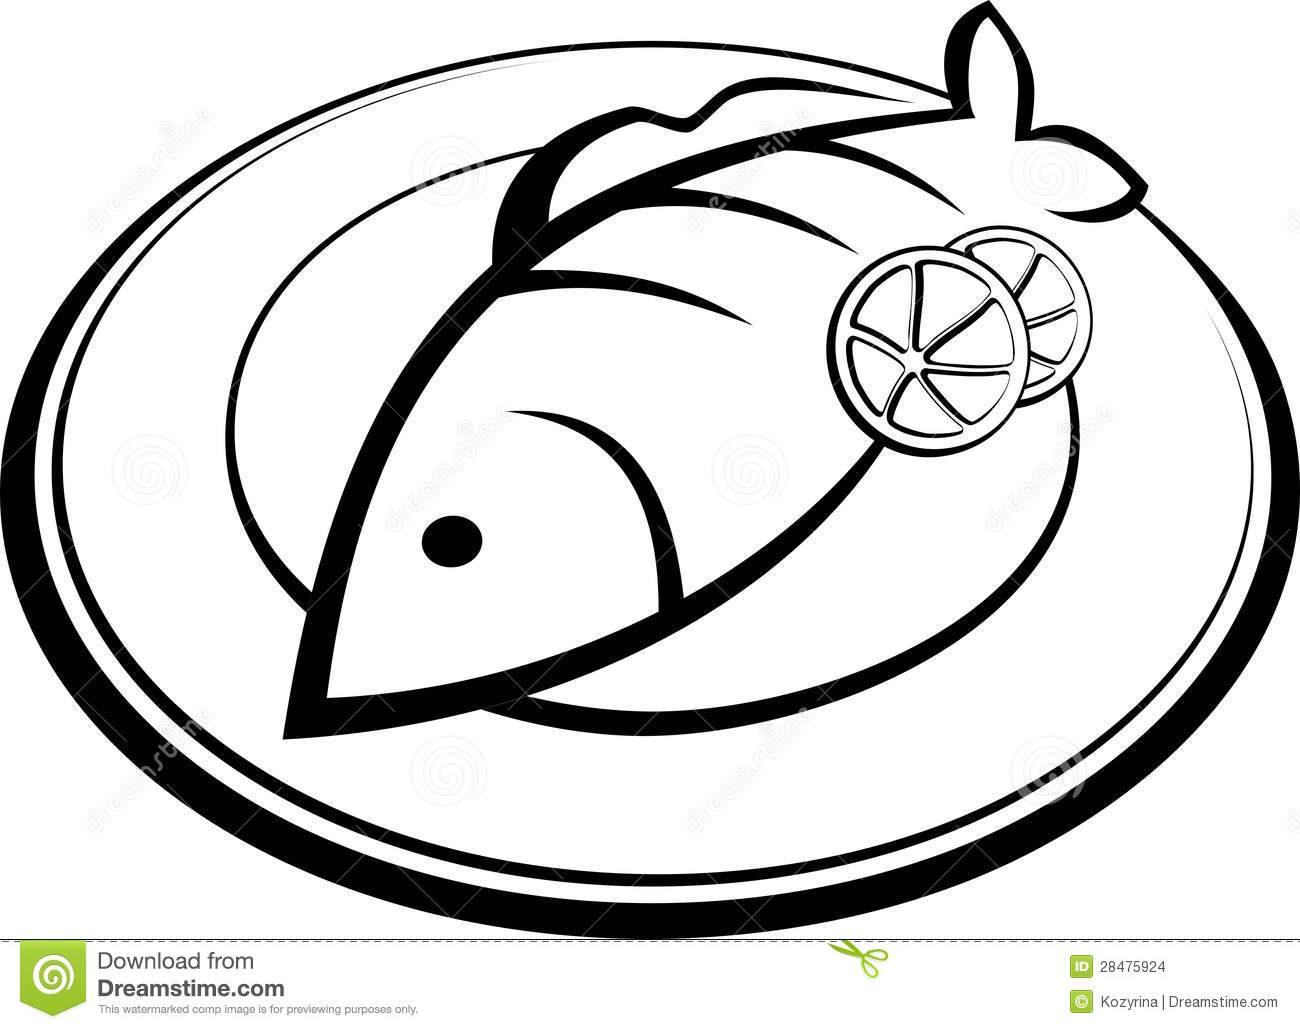 1300x1029 Drawn Meat Fried Fish